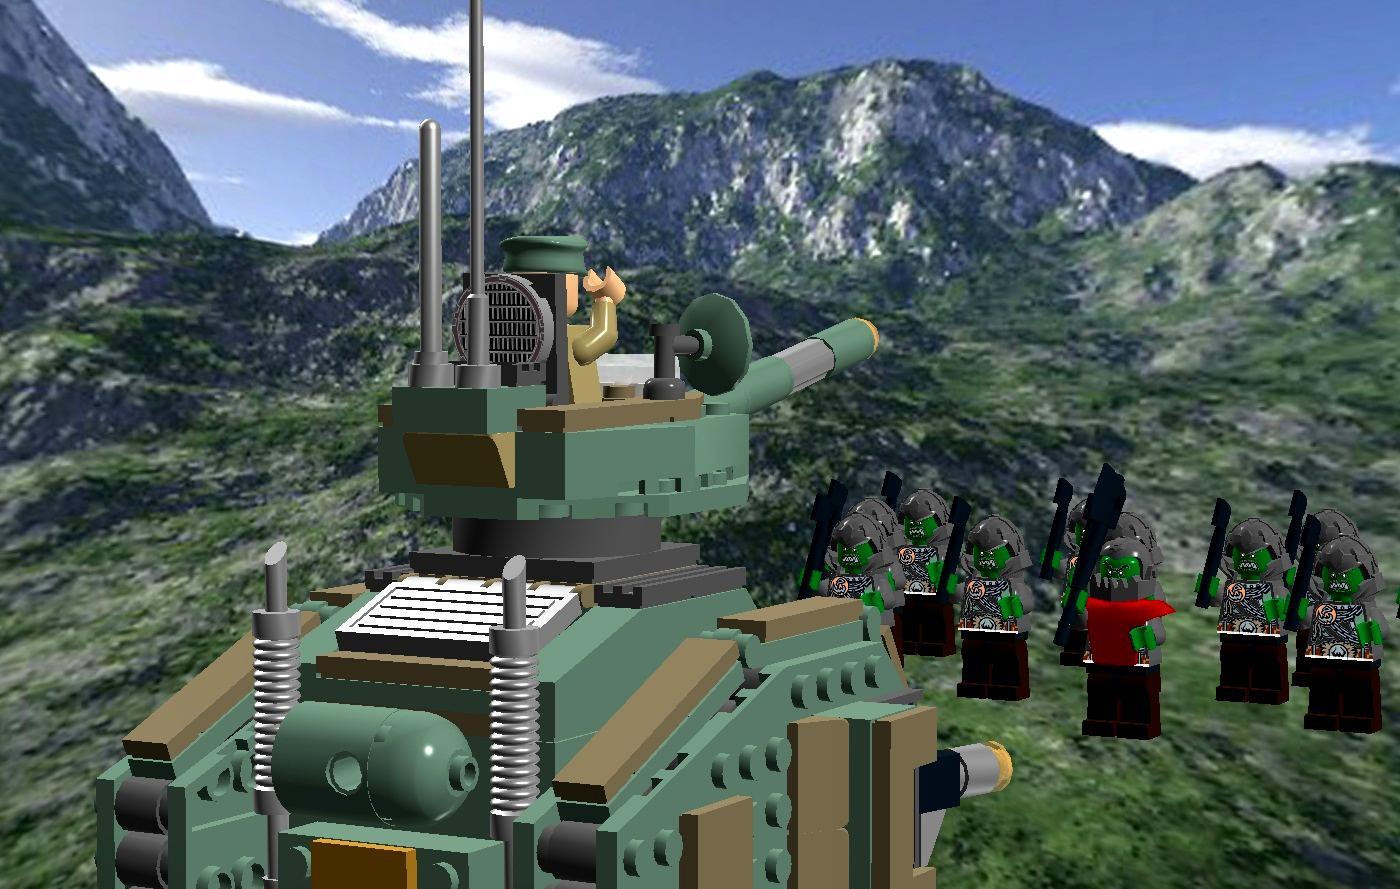 Astra Militarum, Imperial Guard, Lego, Leman Russ